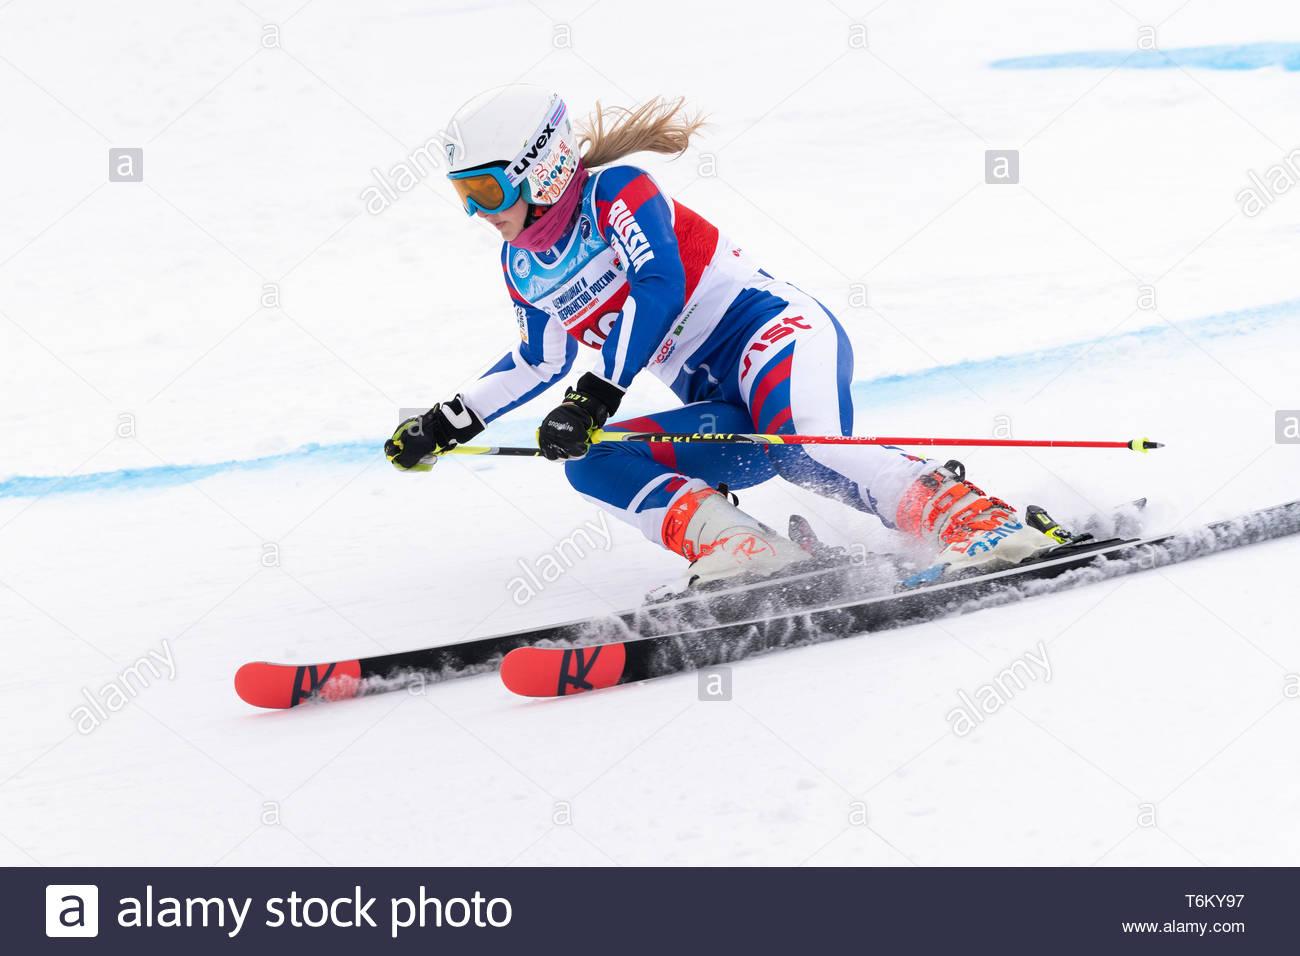 KAMCHATKA, RUSSIA - APR 2, 2019: Russian Women's Alpine Skiing Cup, International Ski Federation Championship giant slalom. Mountain skier Popova Yaro - Stock Image